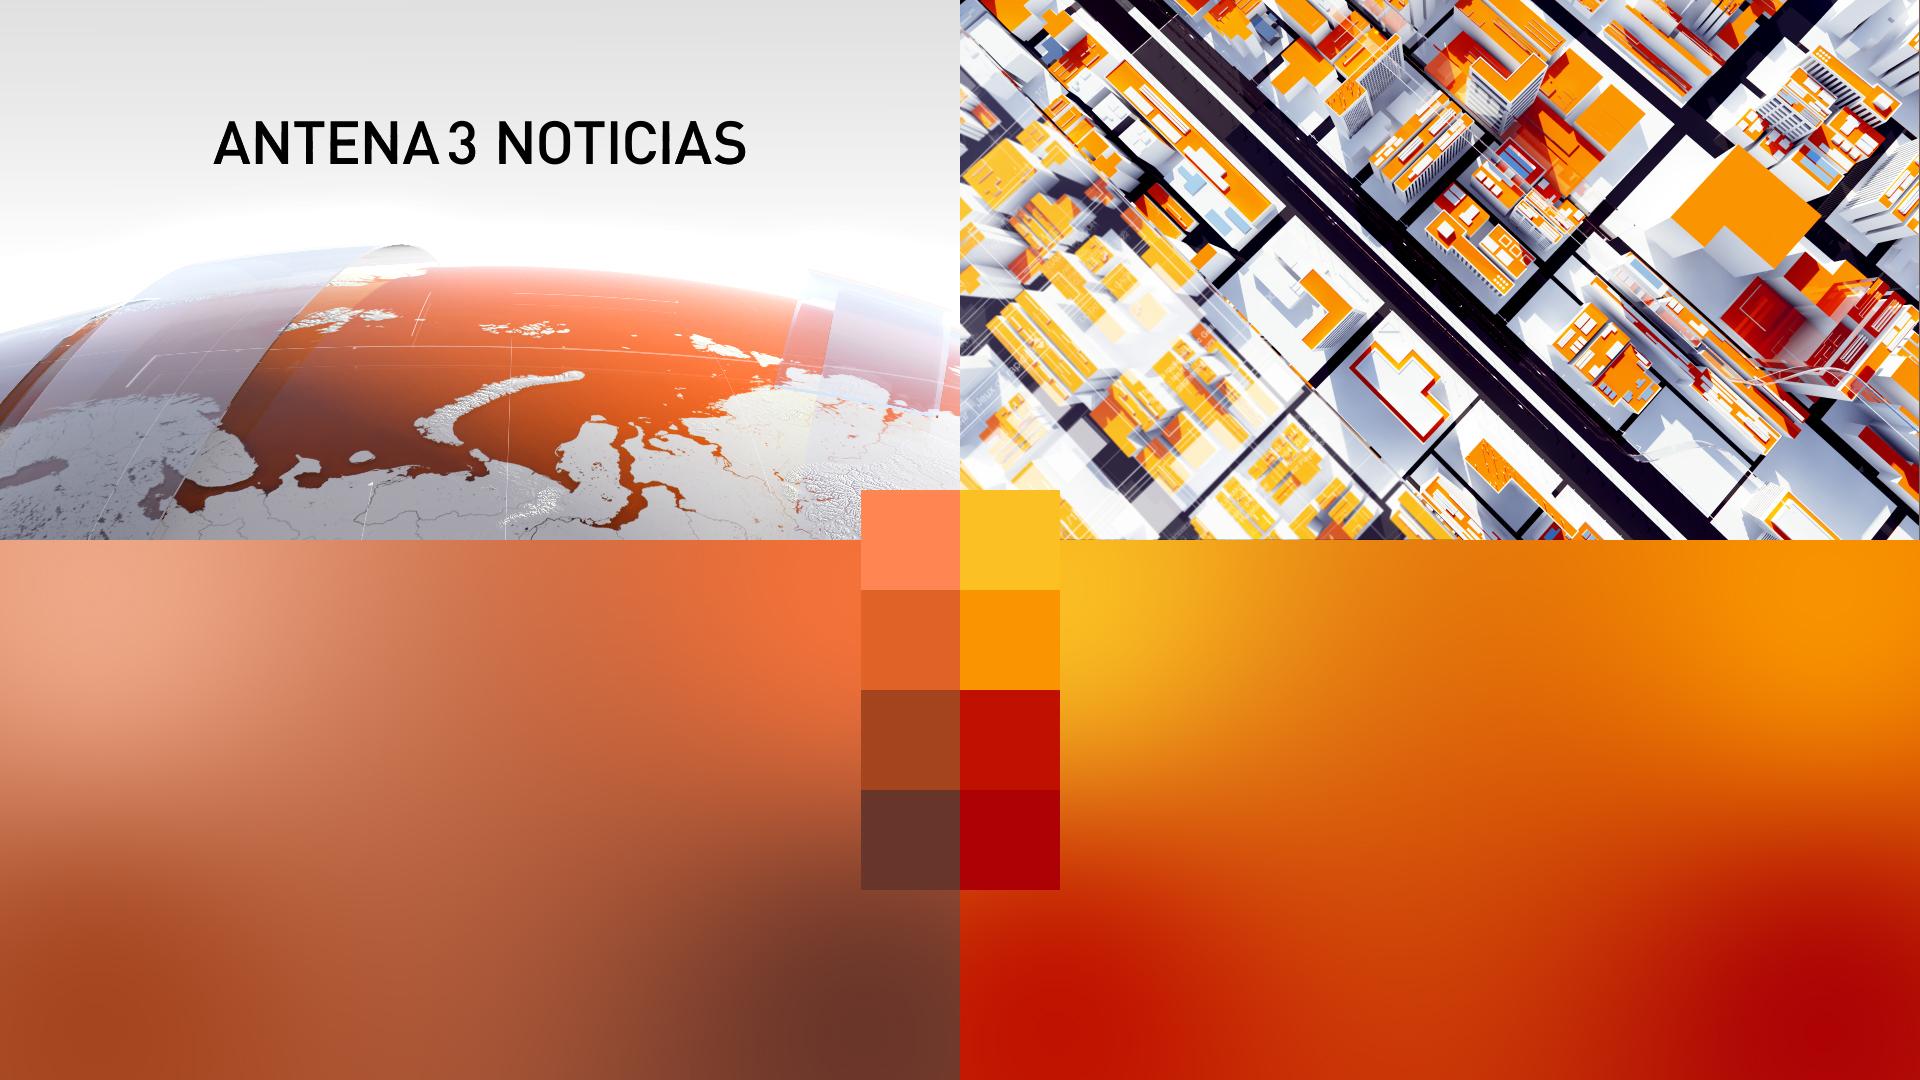 antena-3-noticias-cabecera-branding-telediario-animacion-3d-1980x1080